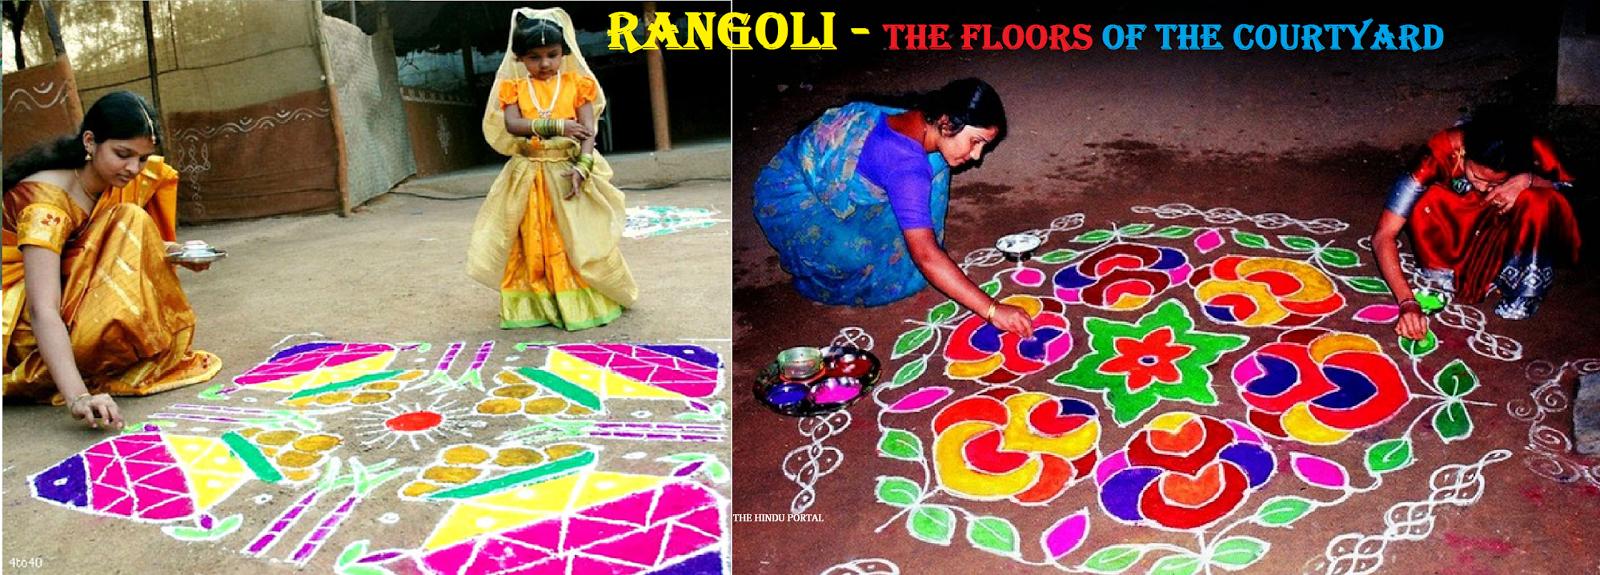 Rangoli - the floors of the courtyard